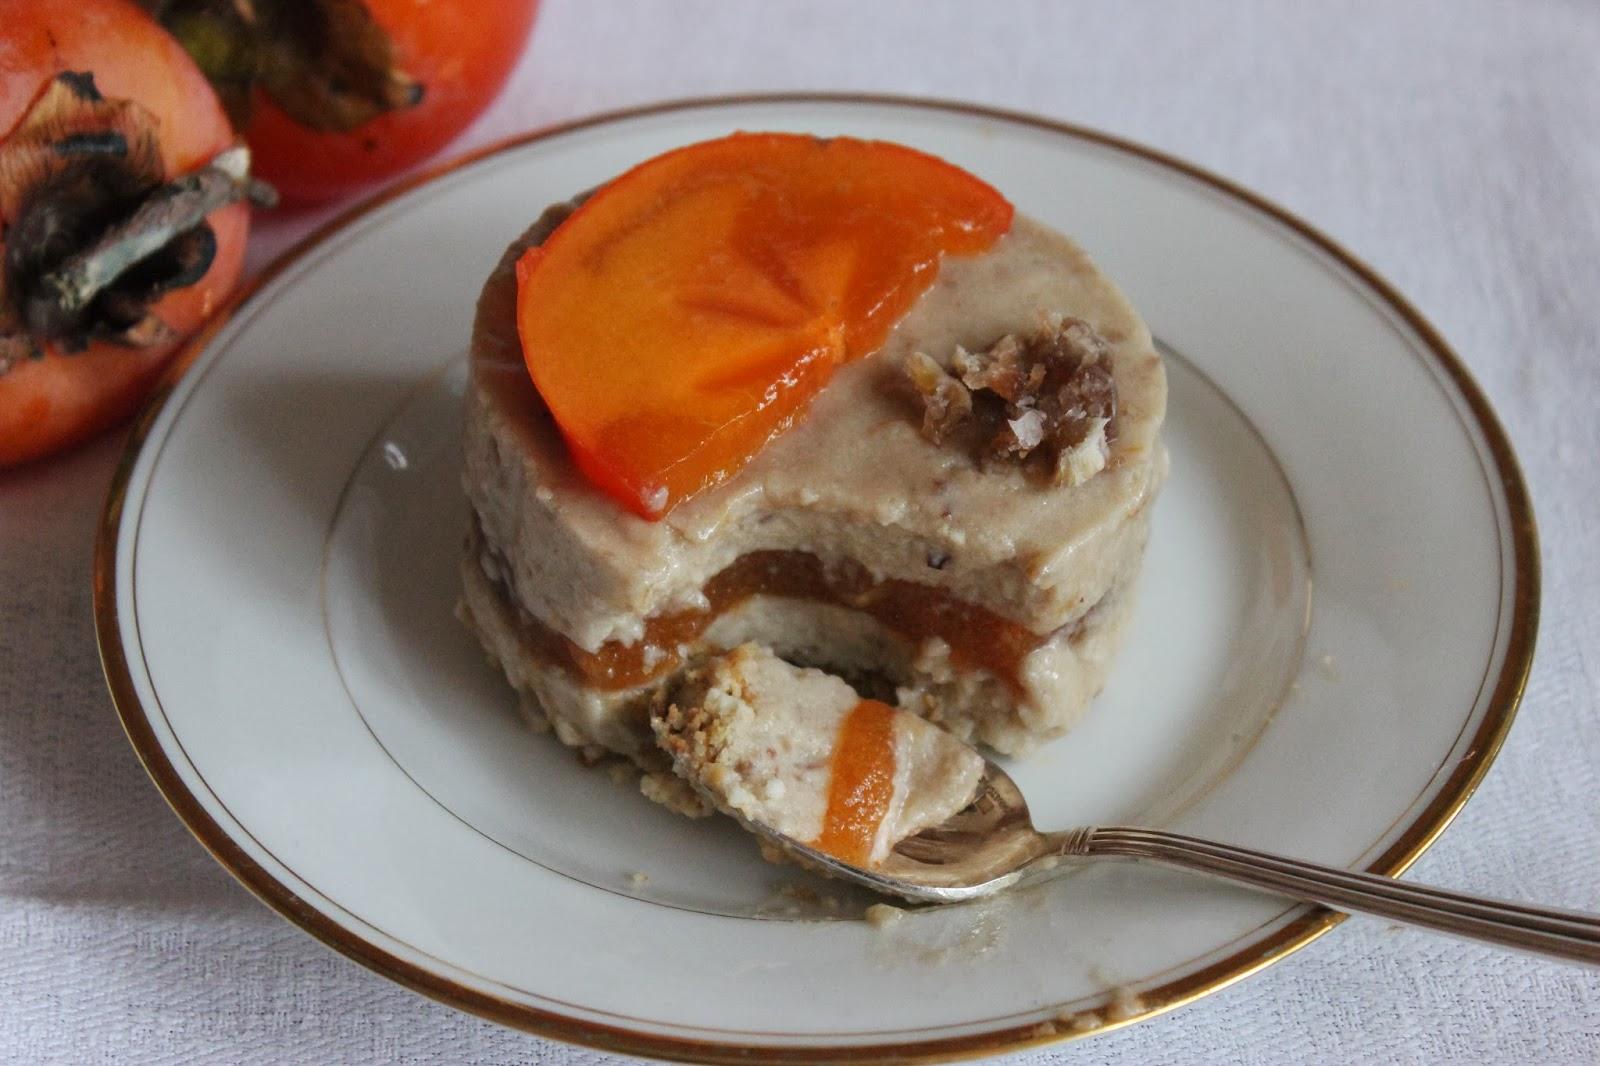 https://cuillereetsaladier.blogspot.com/2014/01/entremet-marrons-glaces-et-kaki.html